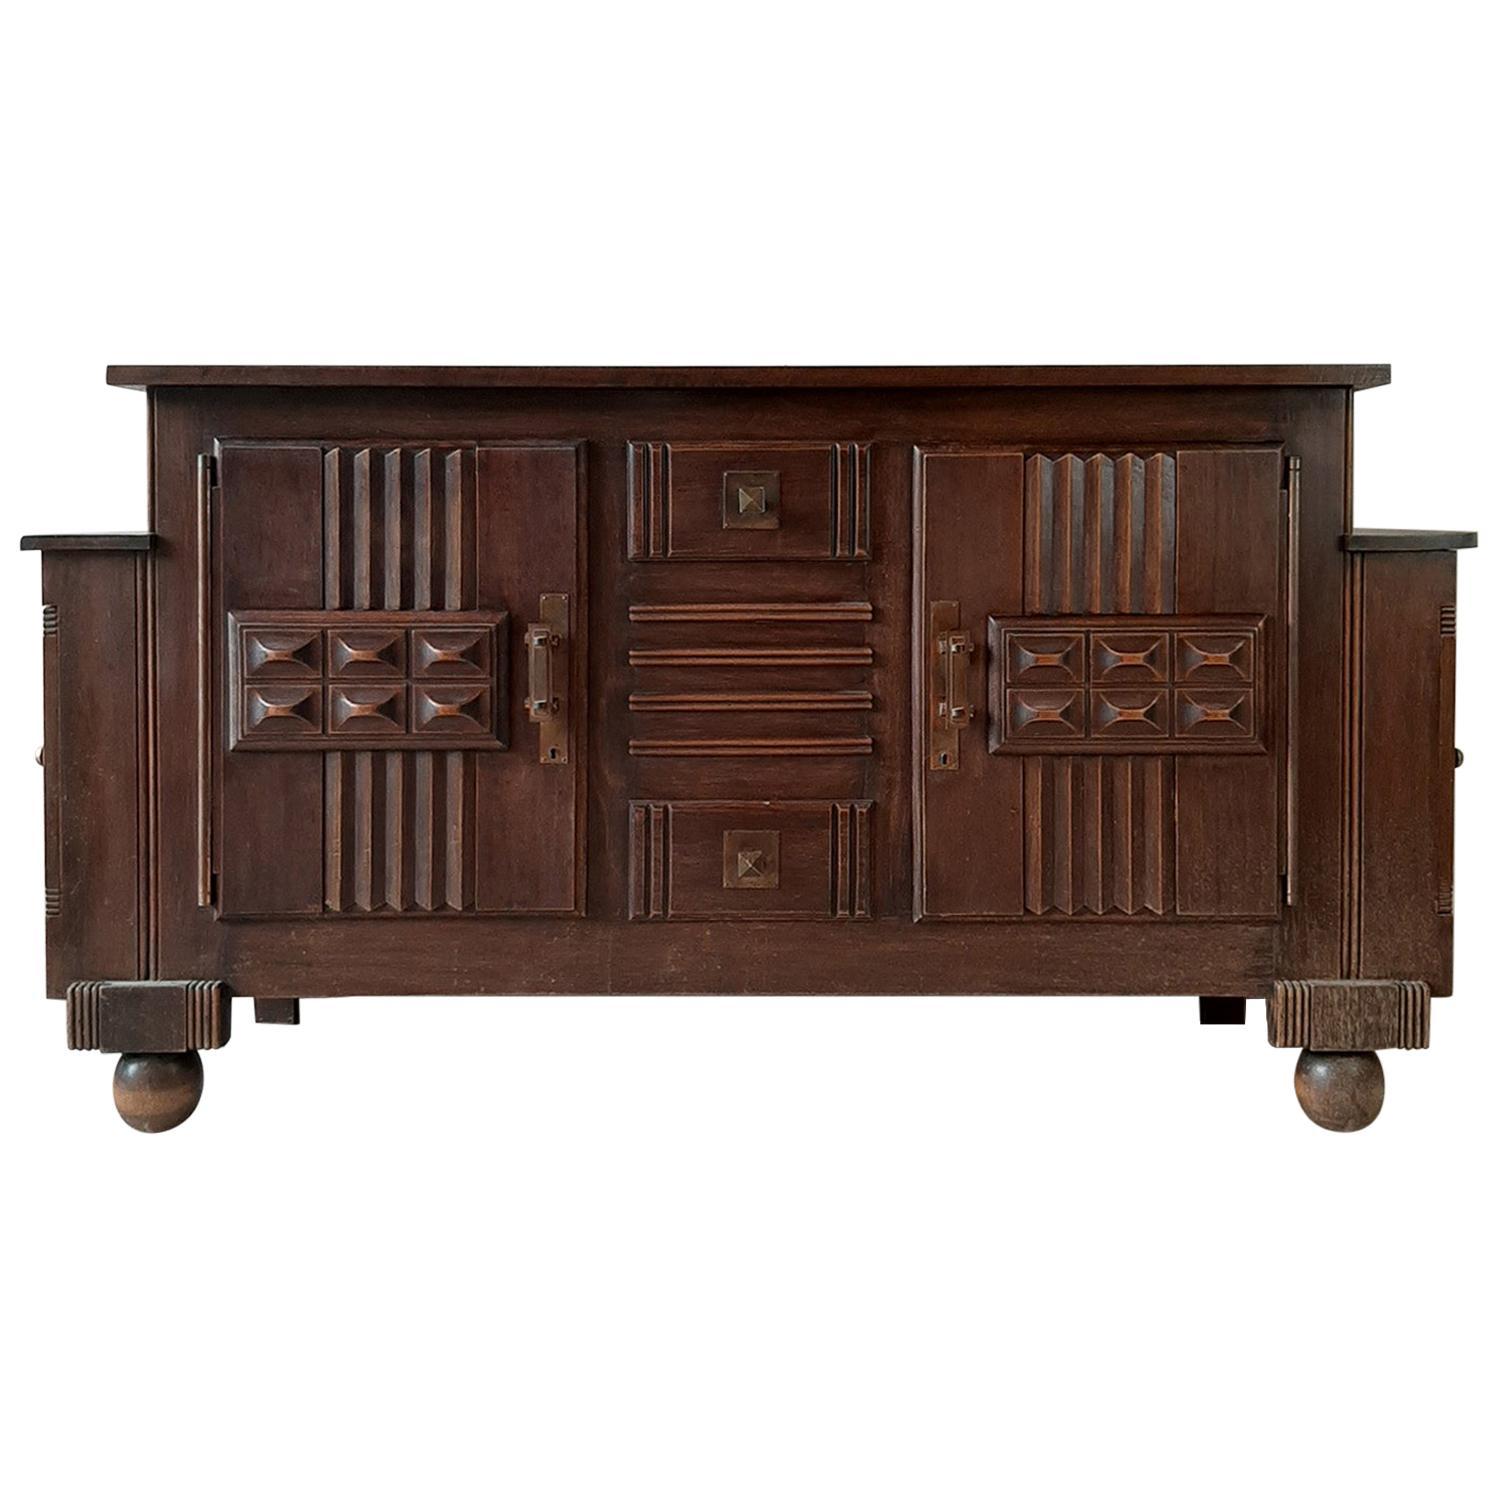 Brutalist style Brown Oak Sideboard, Credenza by Charles Dudouyt